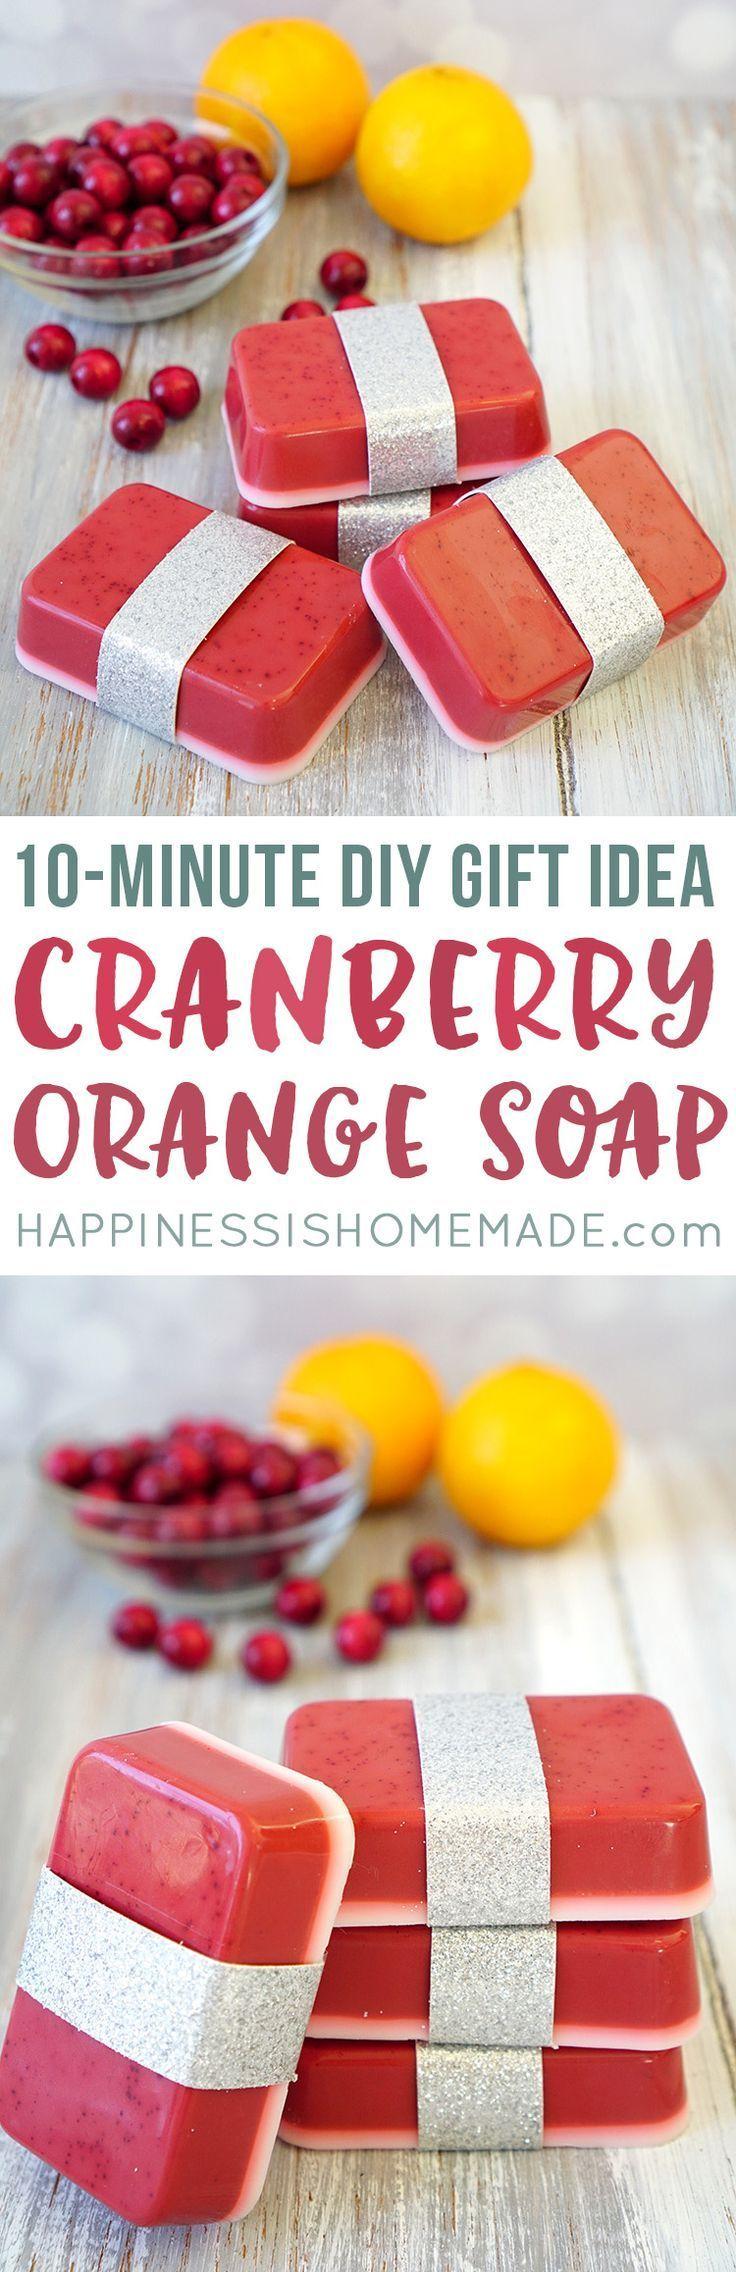 330 best soap making images on pinterest   make soap, crafts and